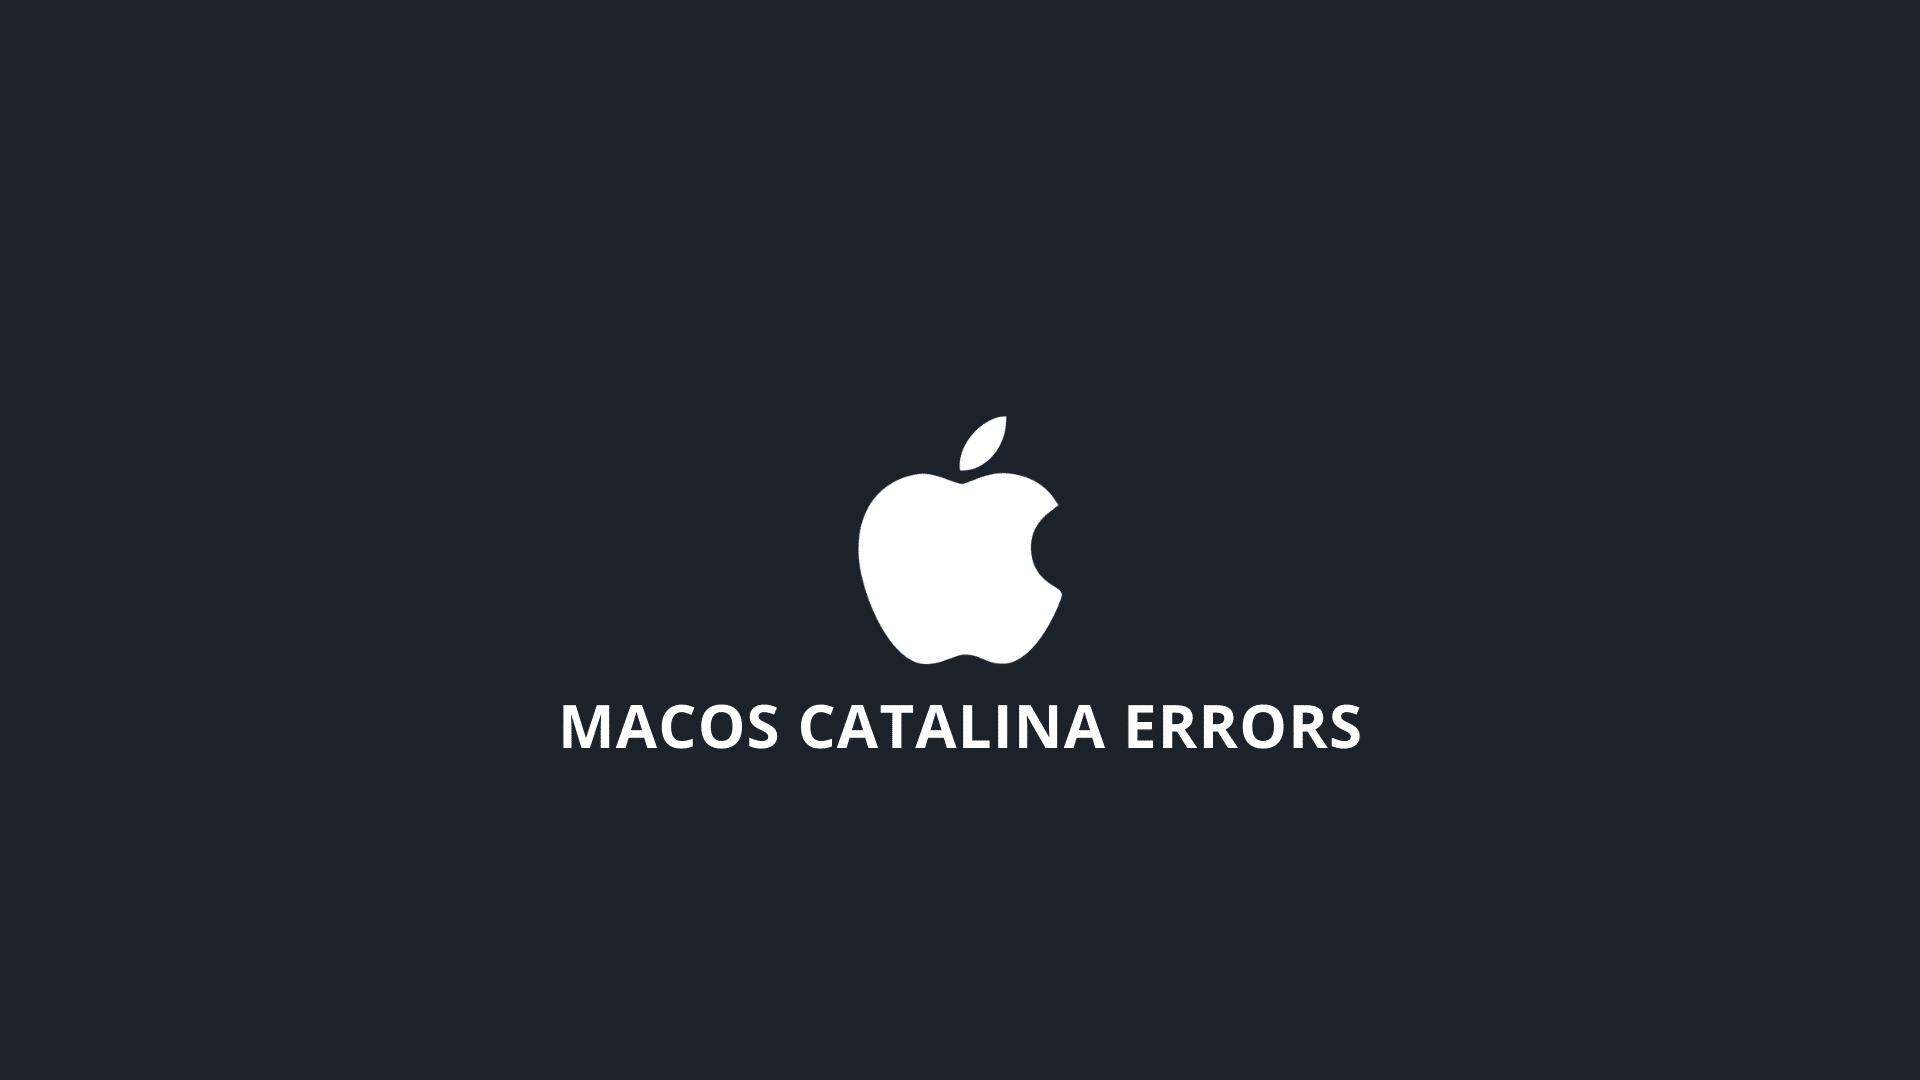 macOS CATALINA ERRORS